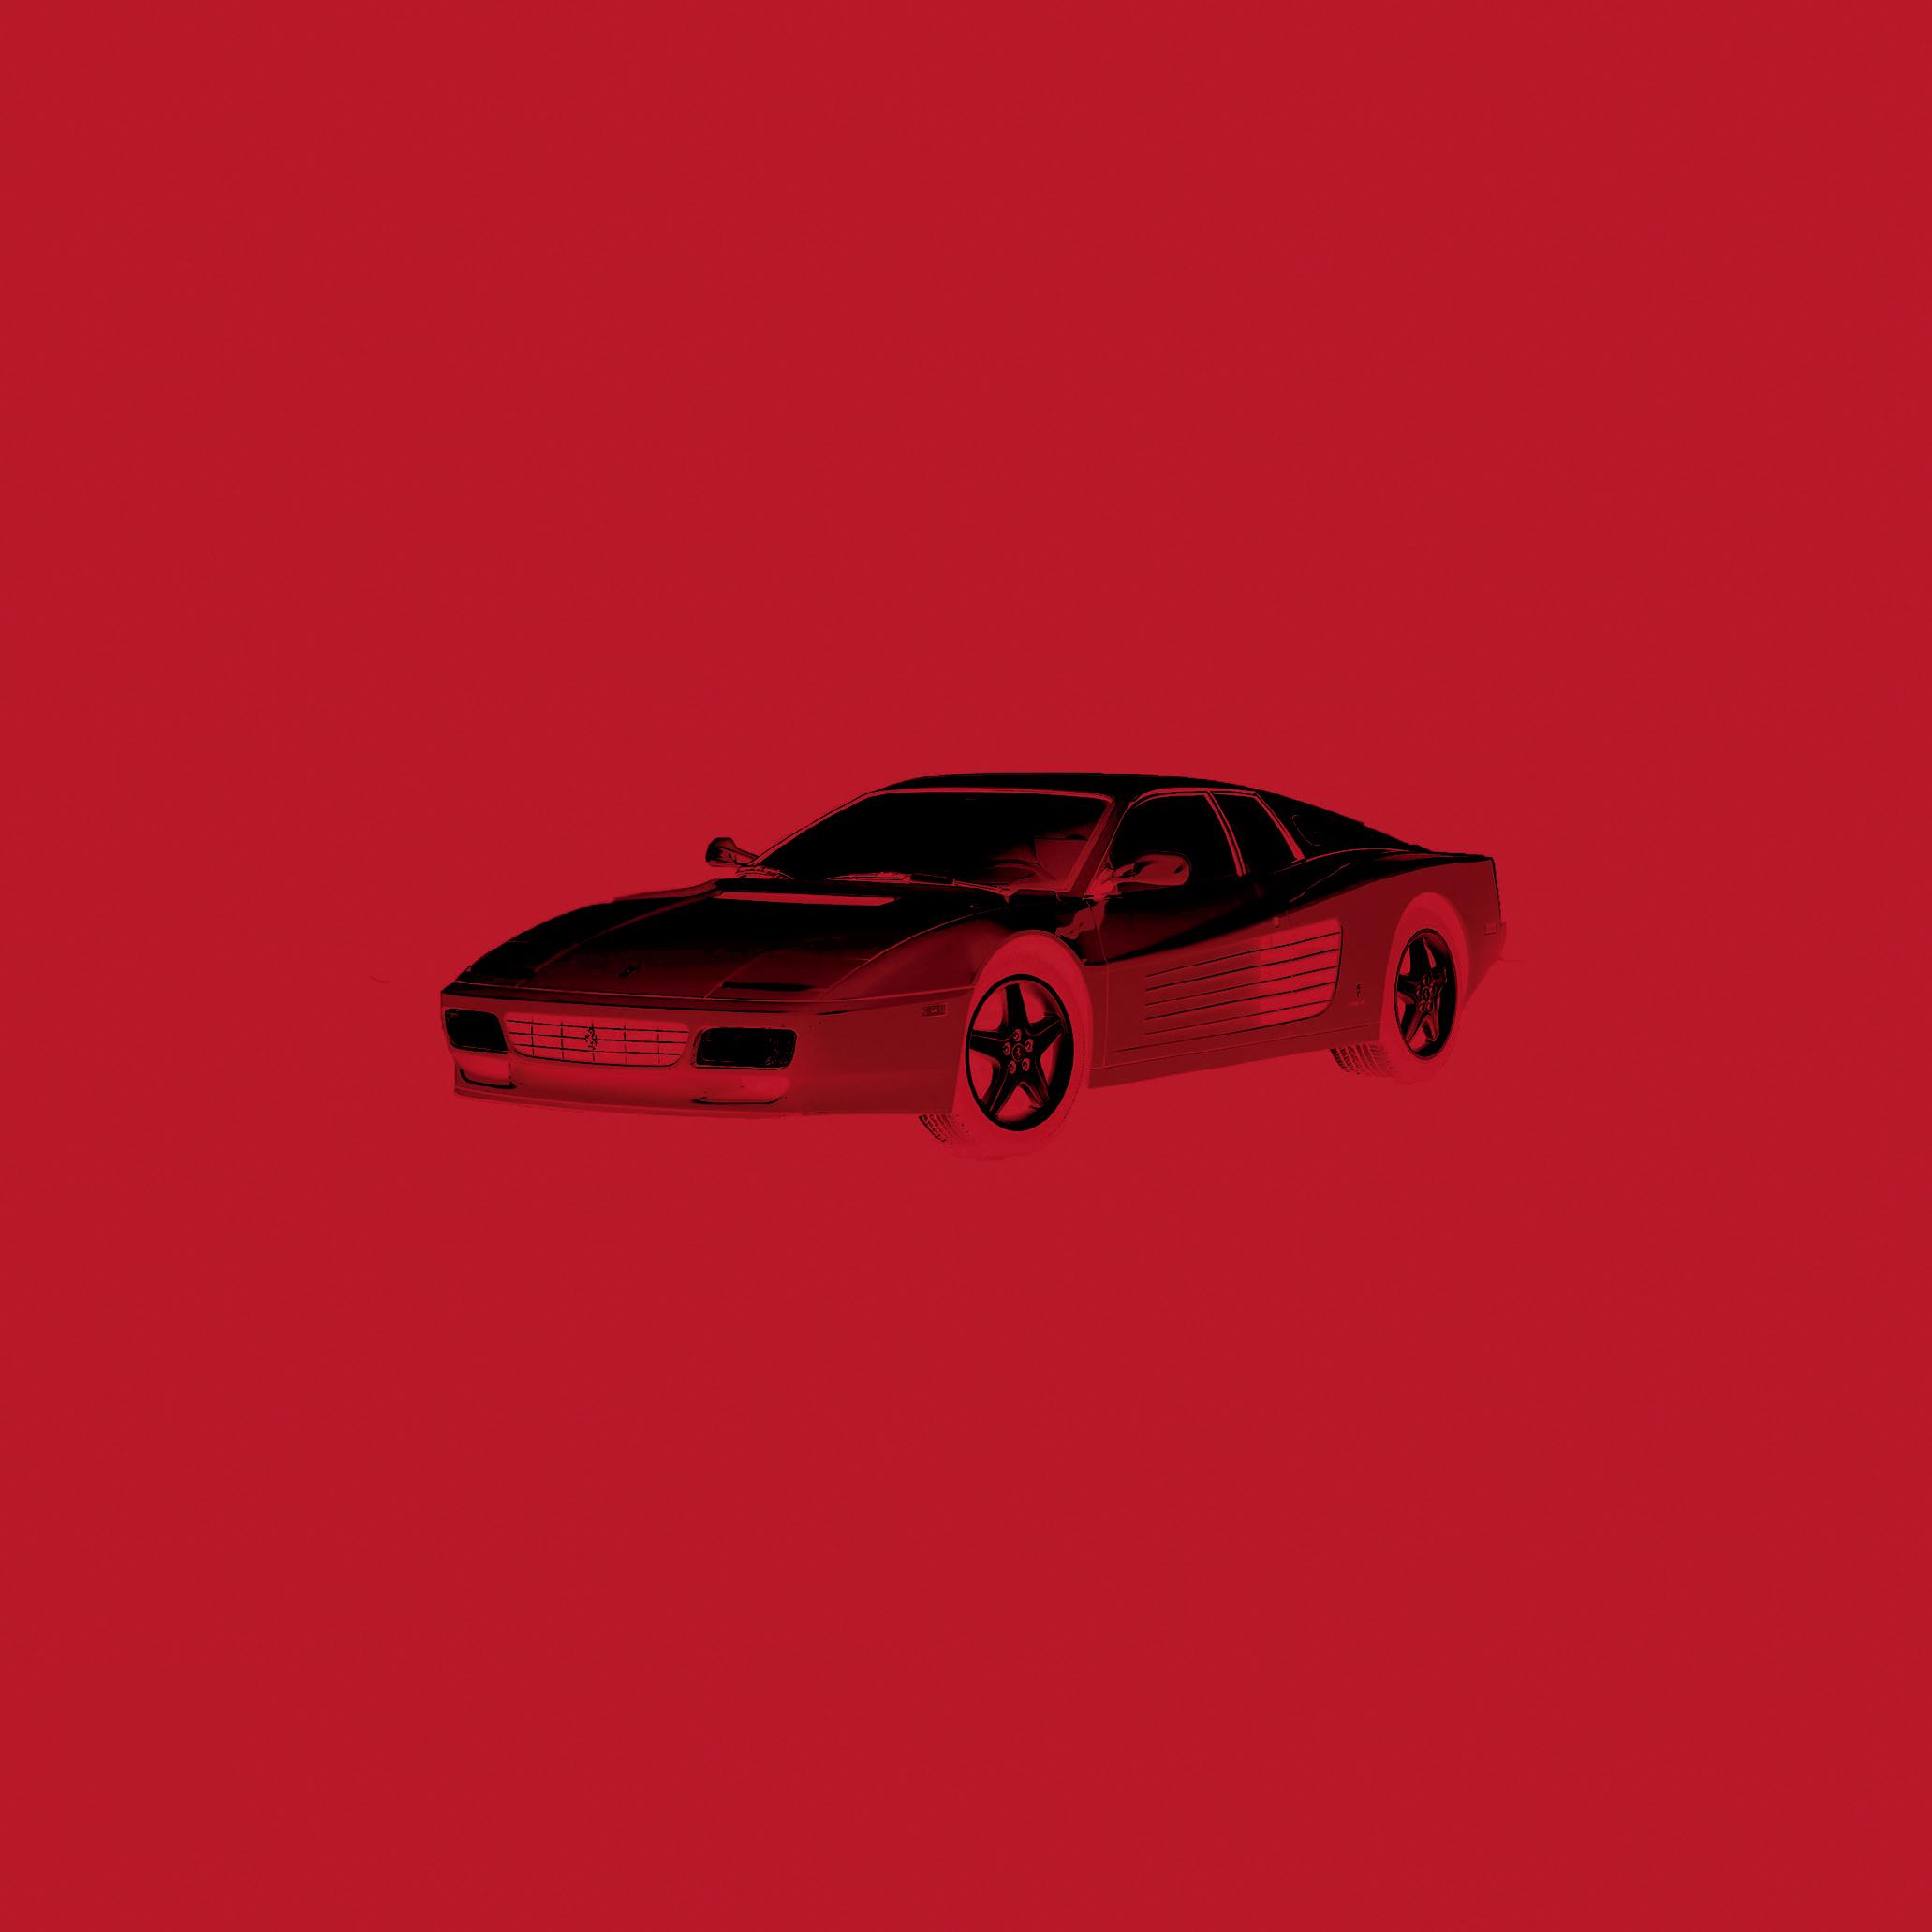 """Ferrari Dreaming"" Single Art"